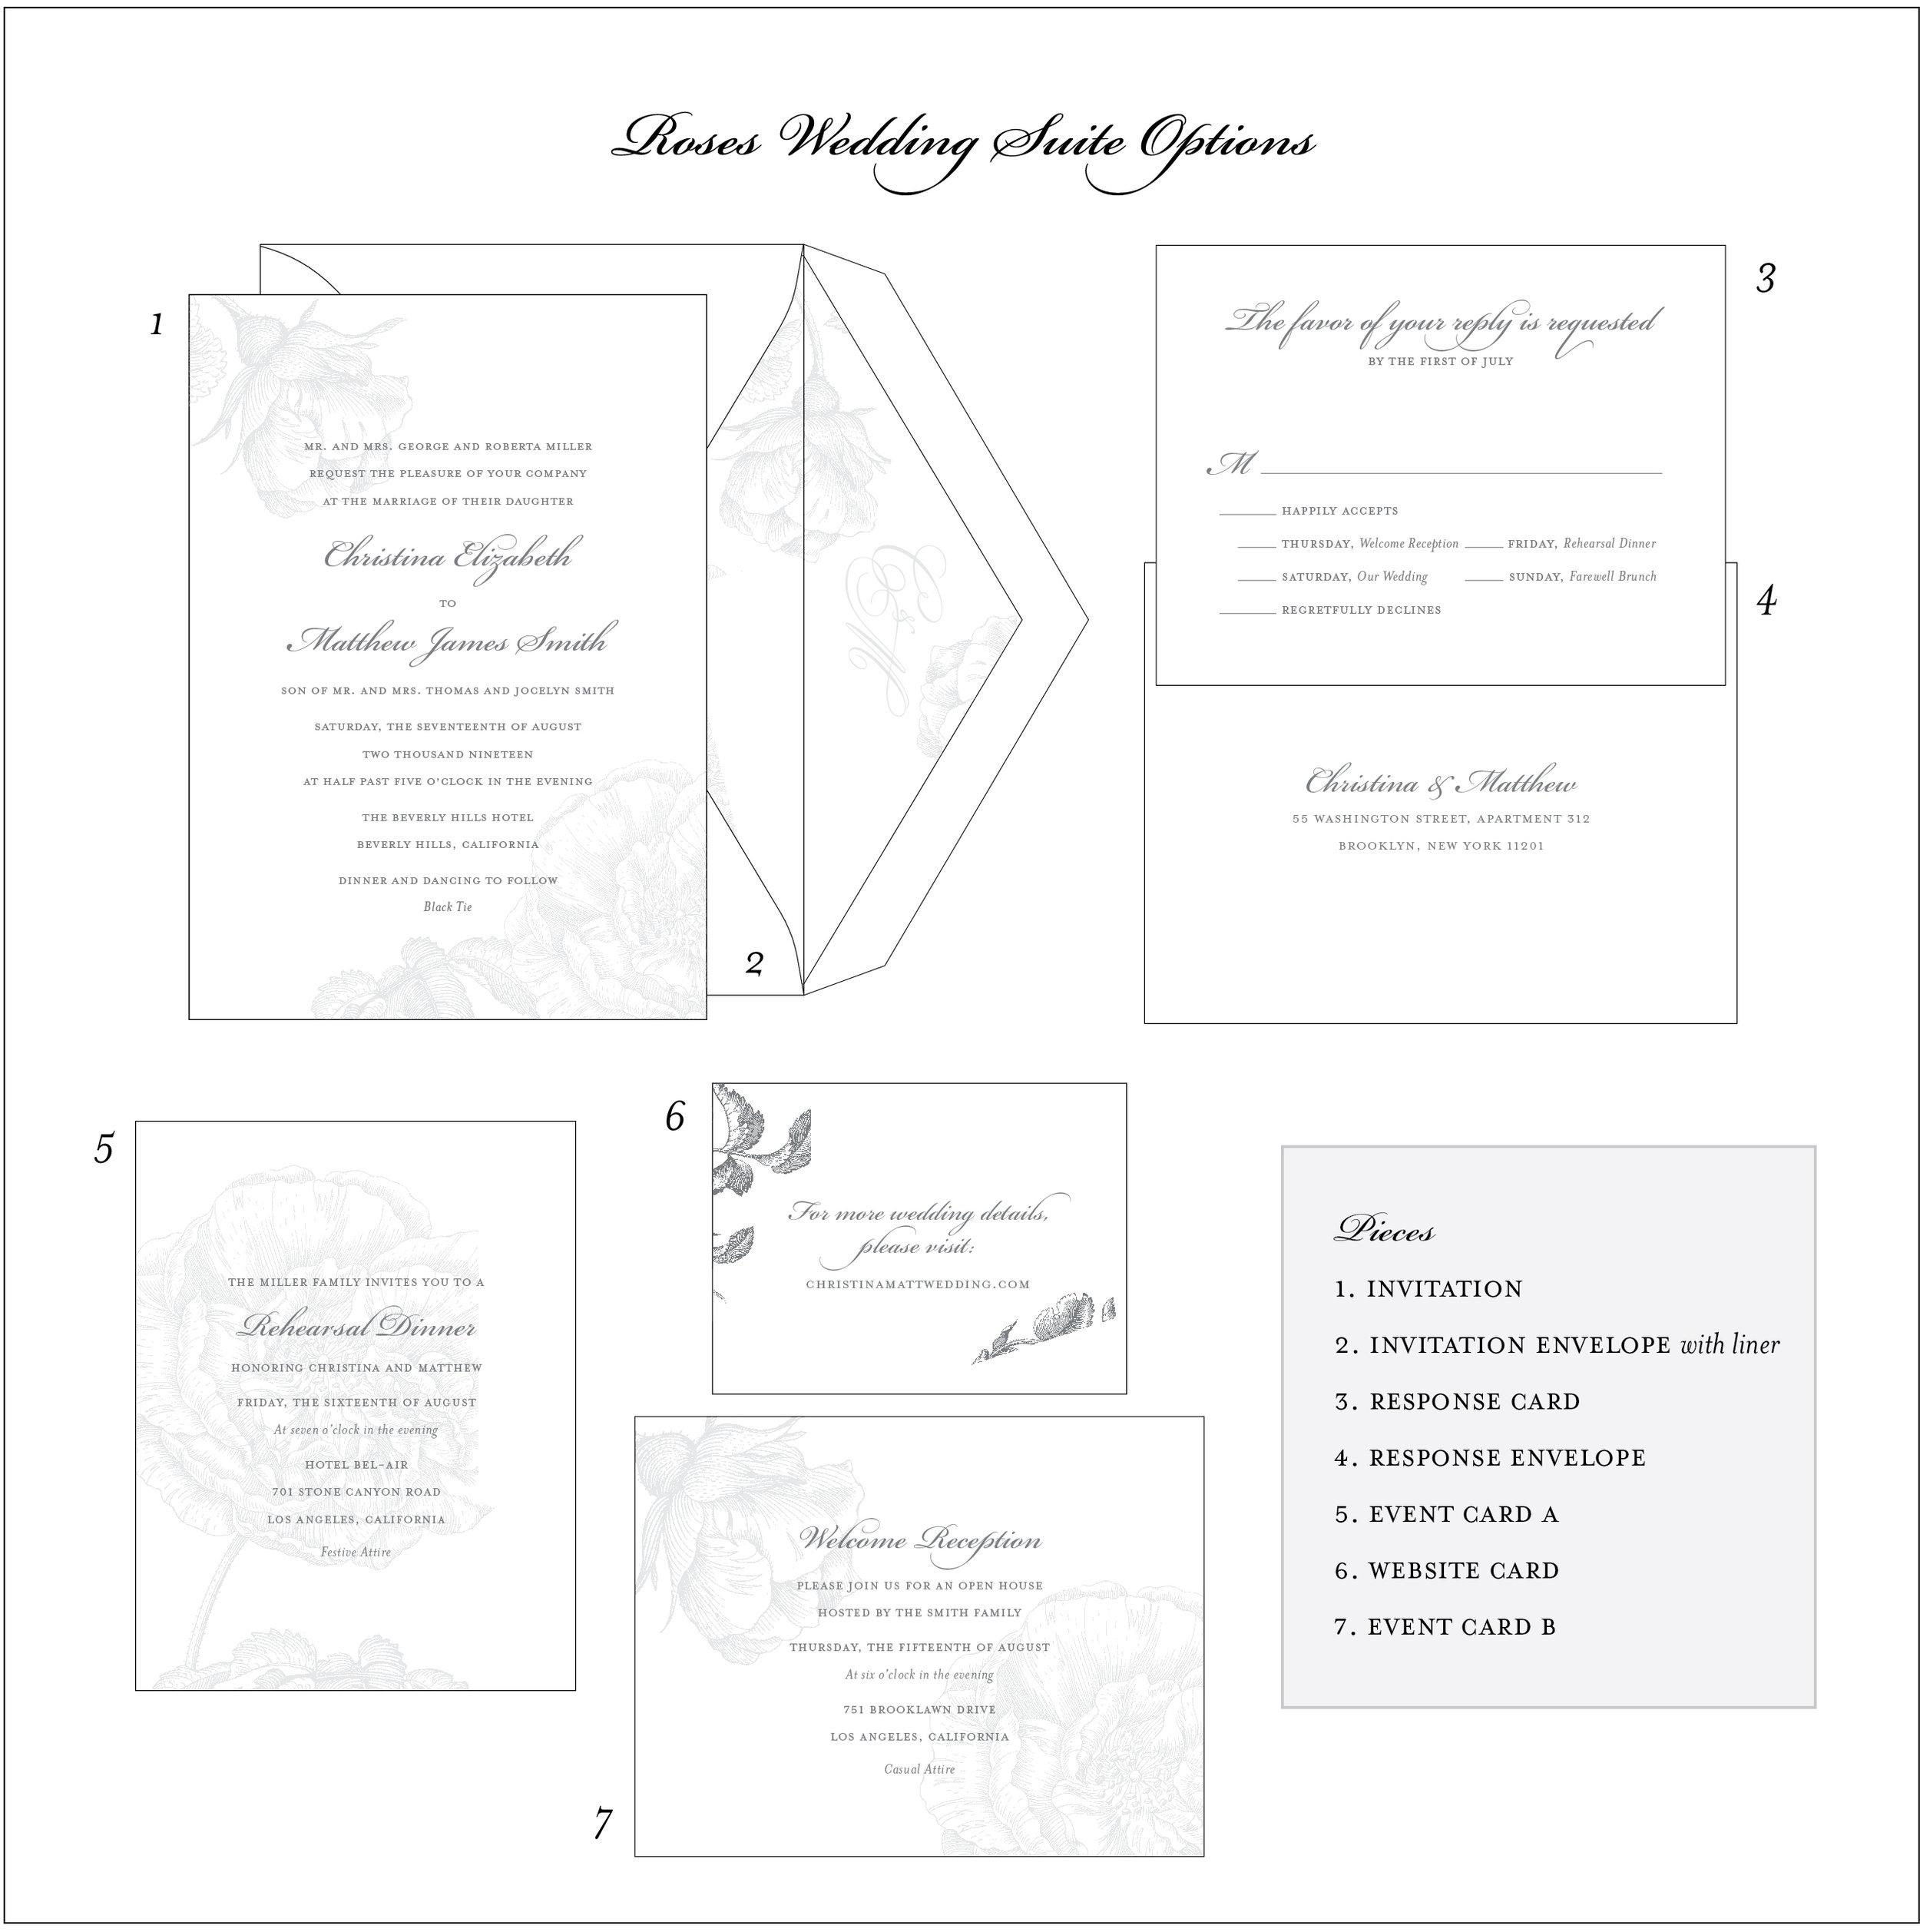 Website_Invite_Options-ROSES-A.jpg